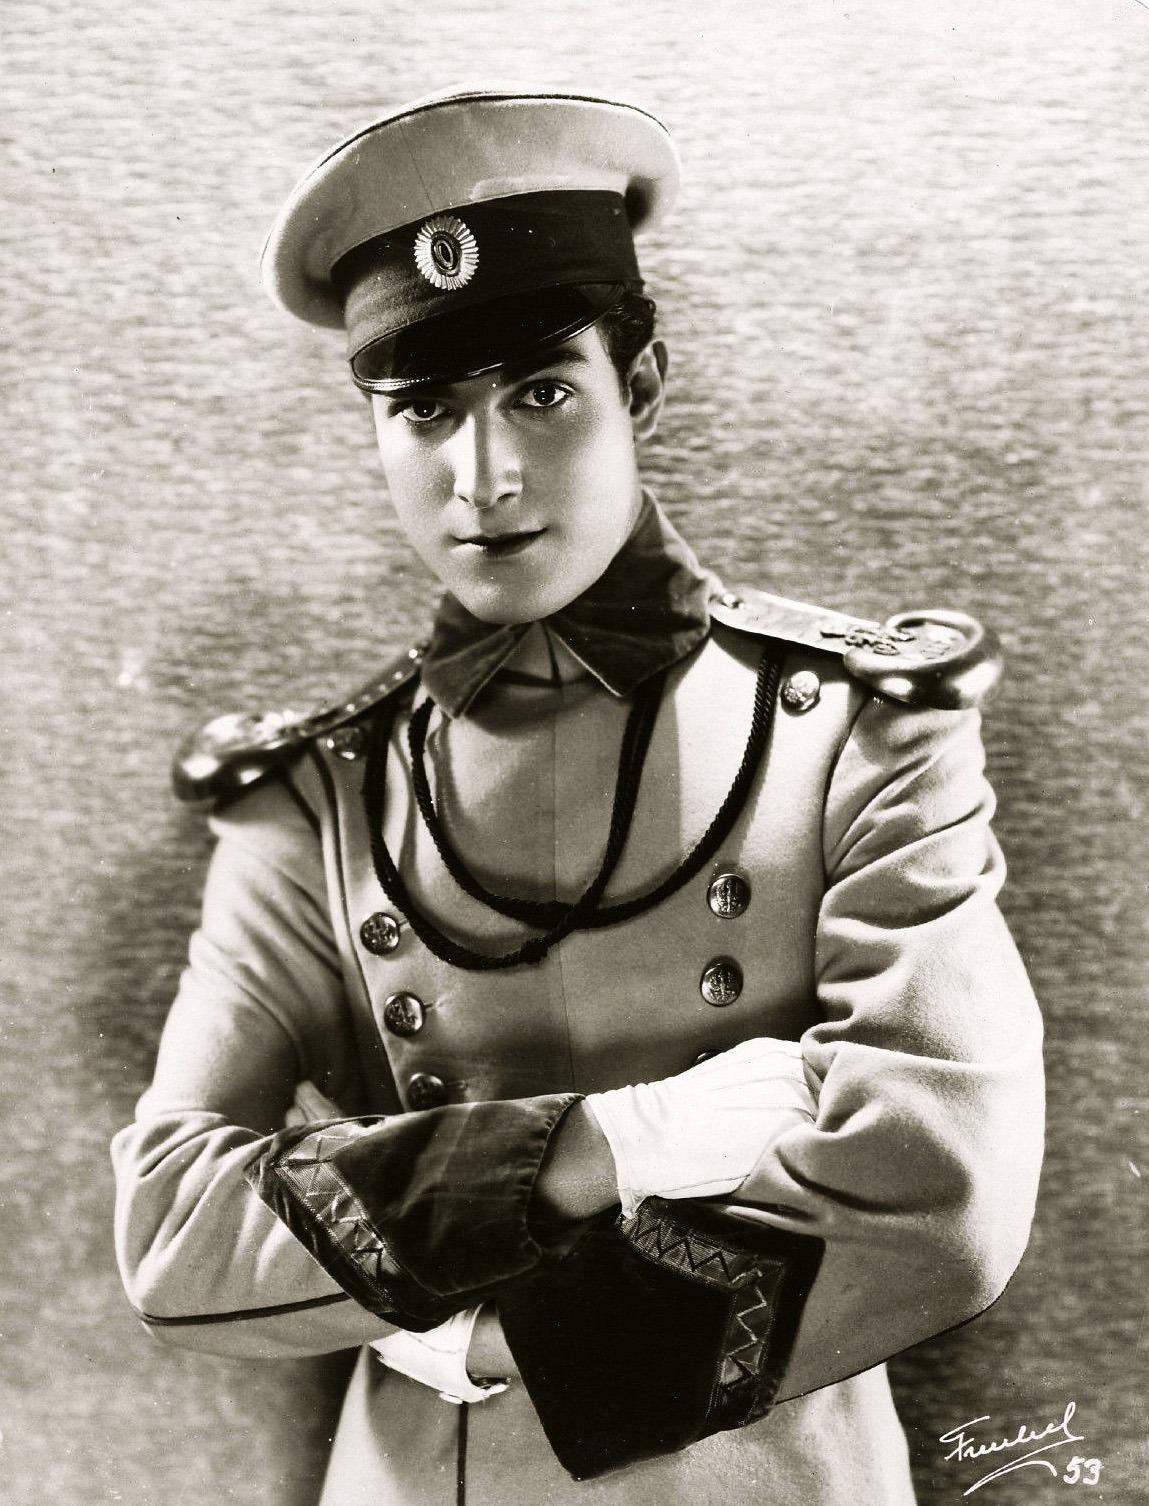 Raymond Keane, 1926